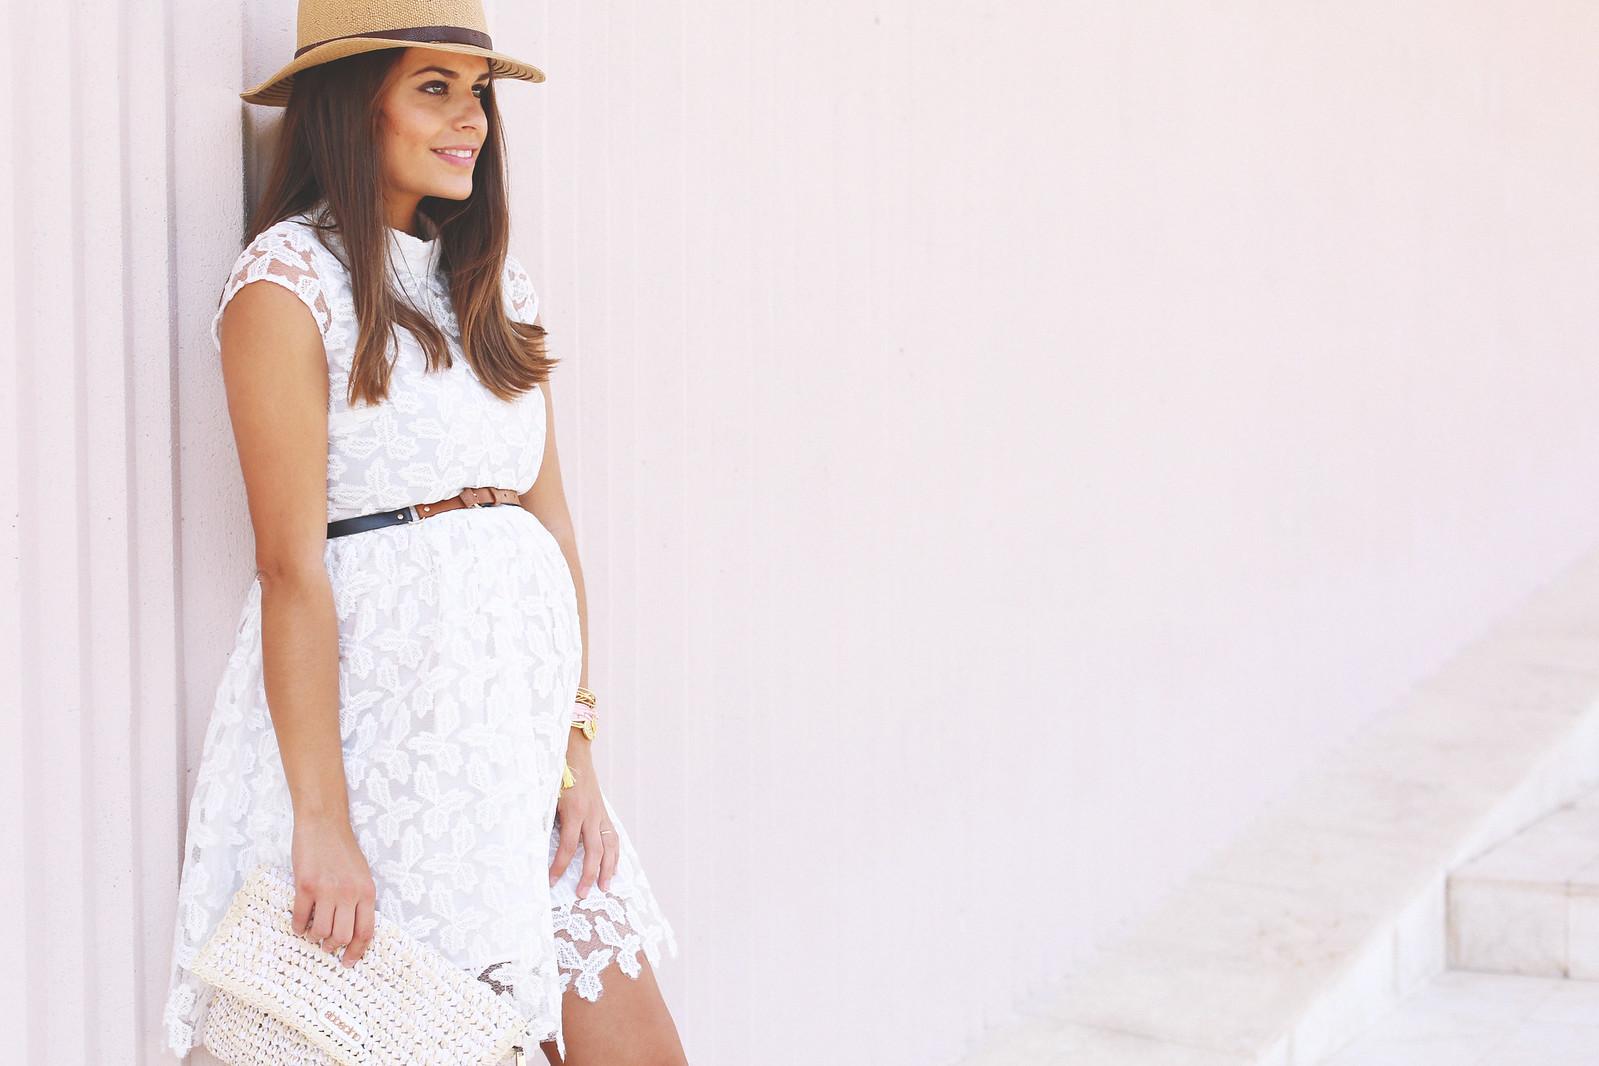 4. lace white short dress - jessie chanes - pregnancy